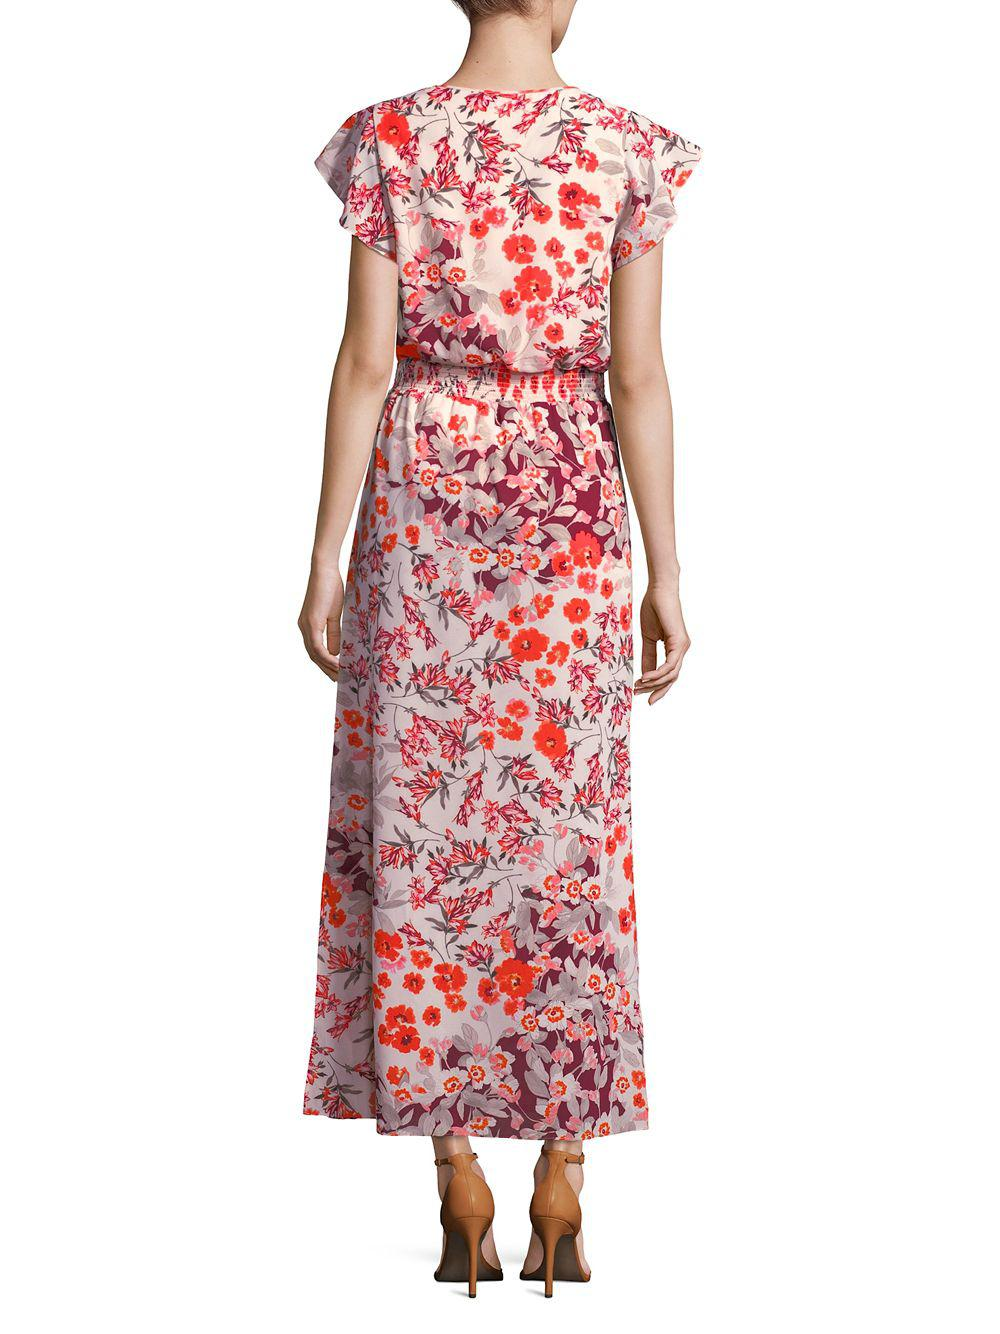 d77c1943c58 Adrianna Papell - Red Floral Flutter-sleeve Maxi Dress - Lyst. View  fullscreen